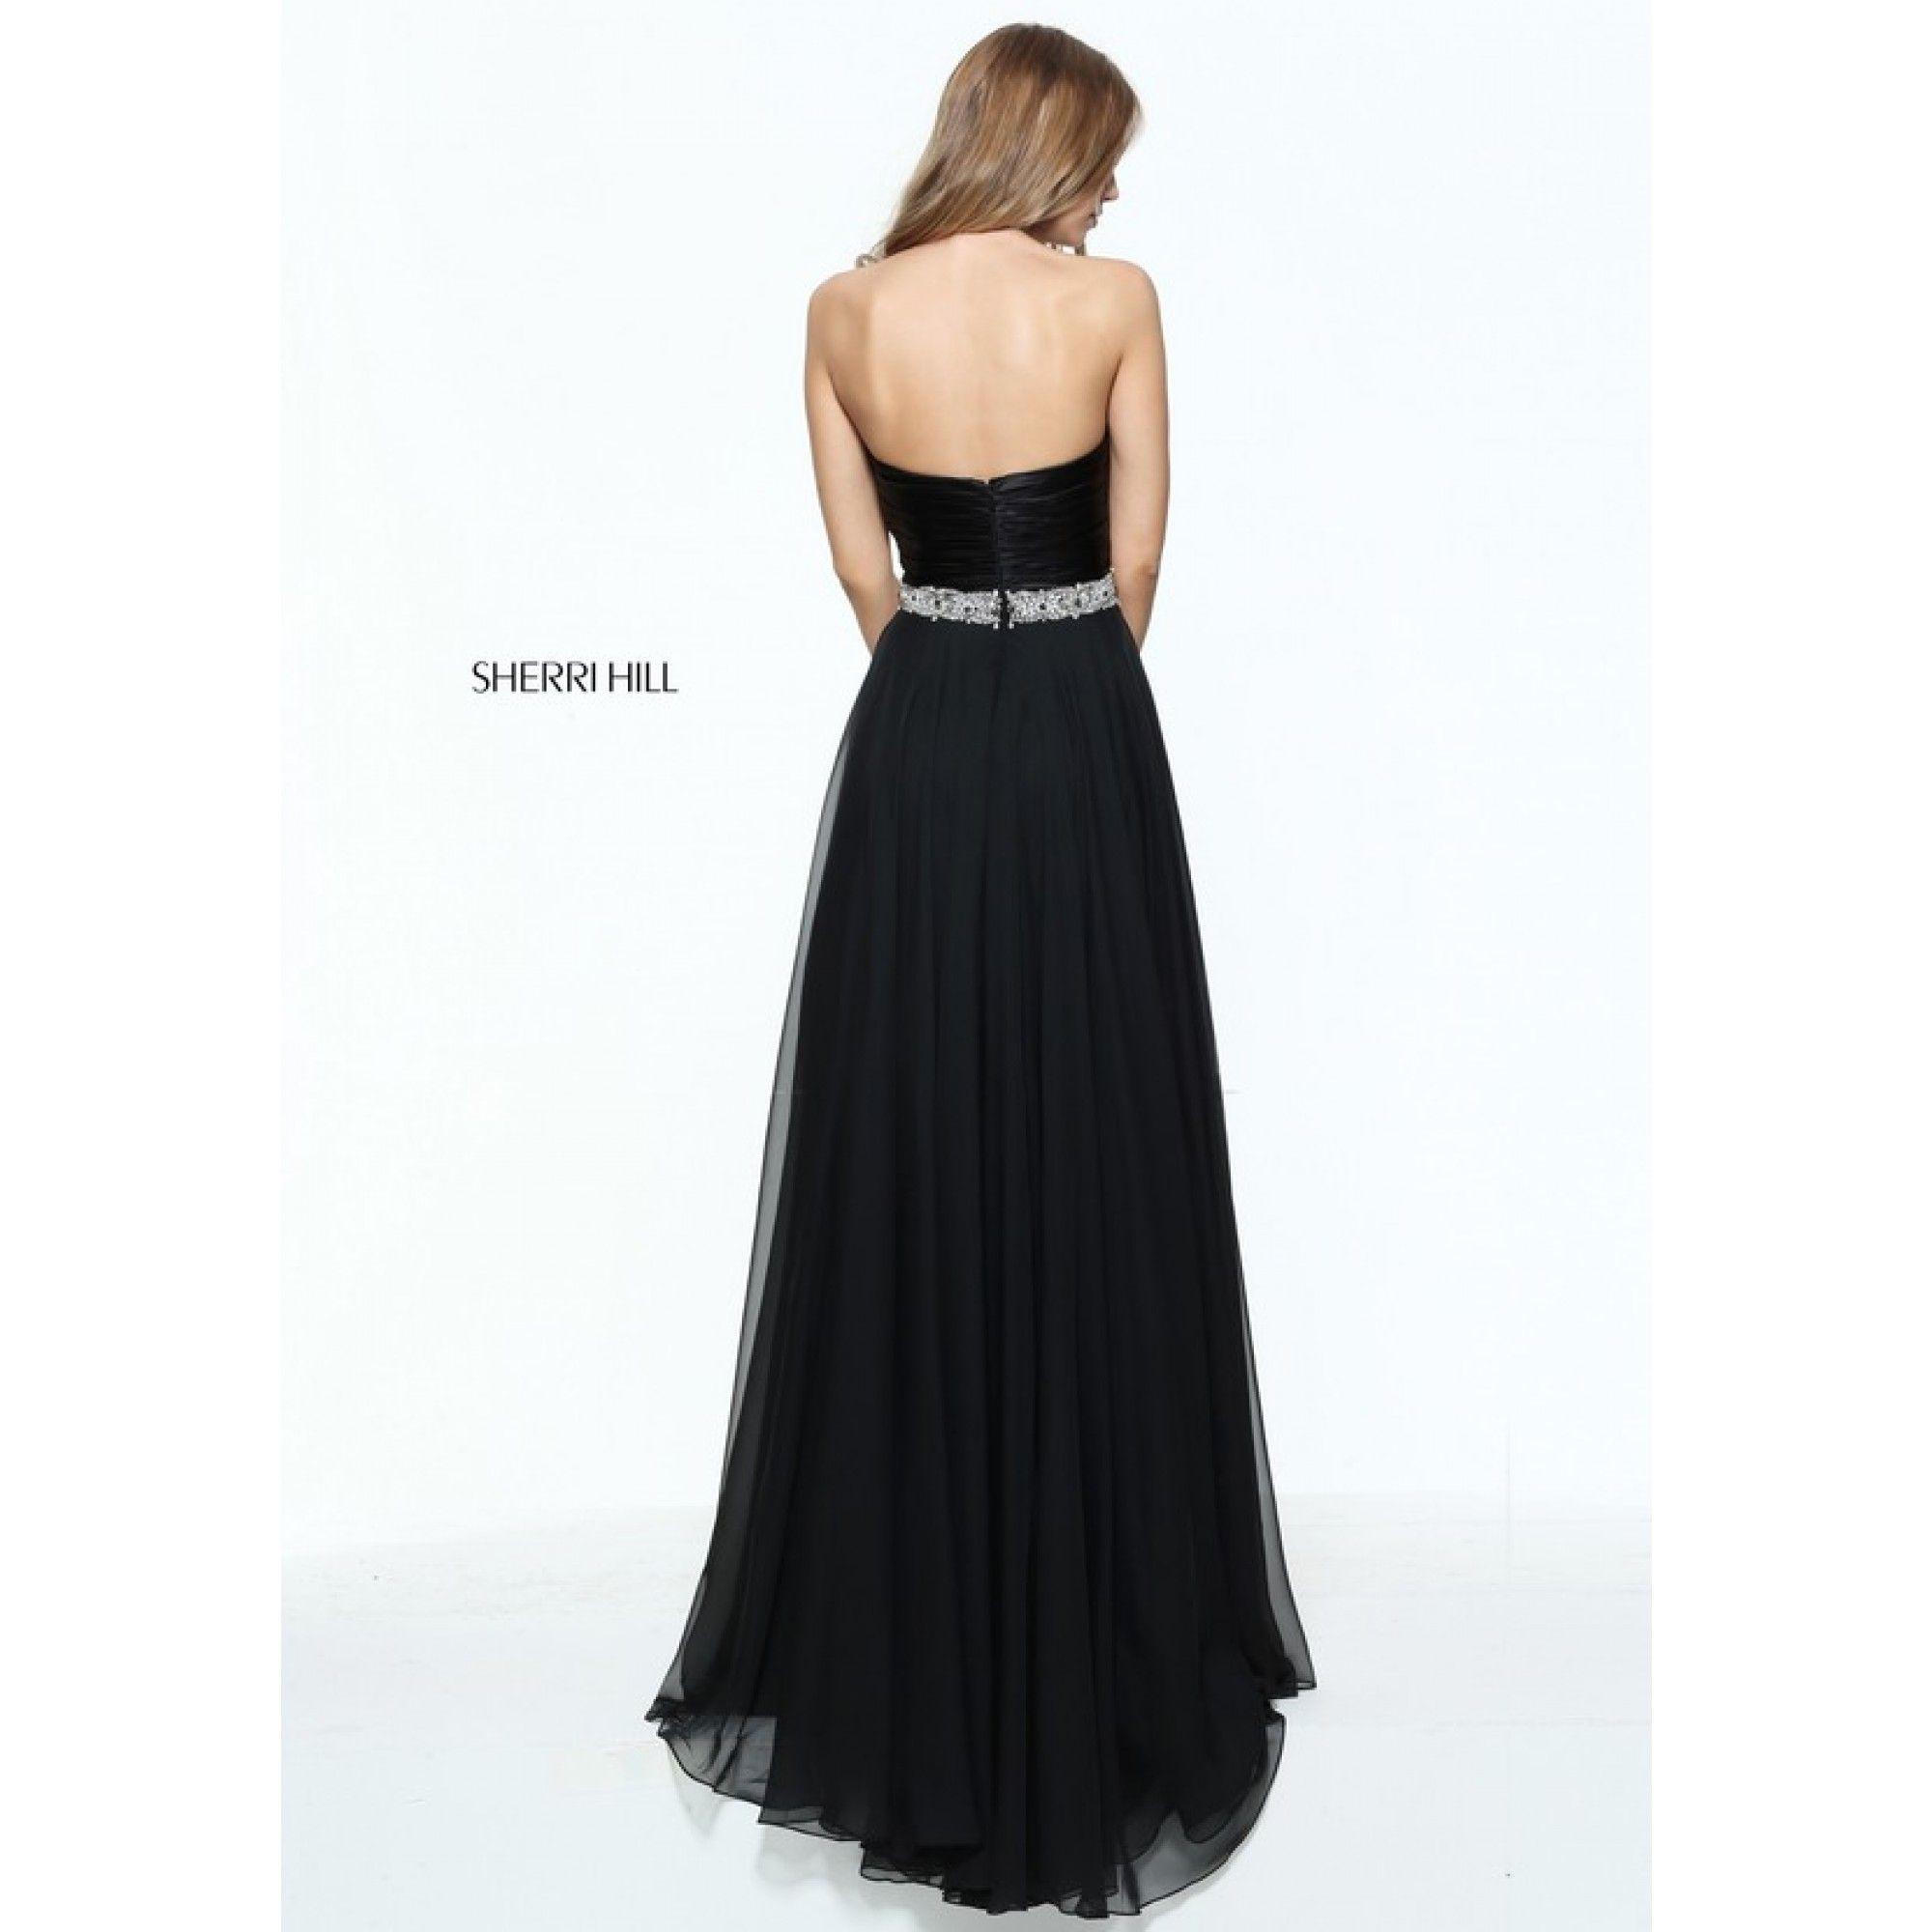 Sherri Hill 51017|Sherri Hill prom dress 51017|tampabridalshops.com|Sherri  Hill